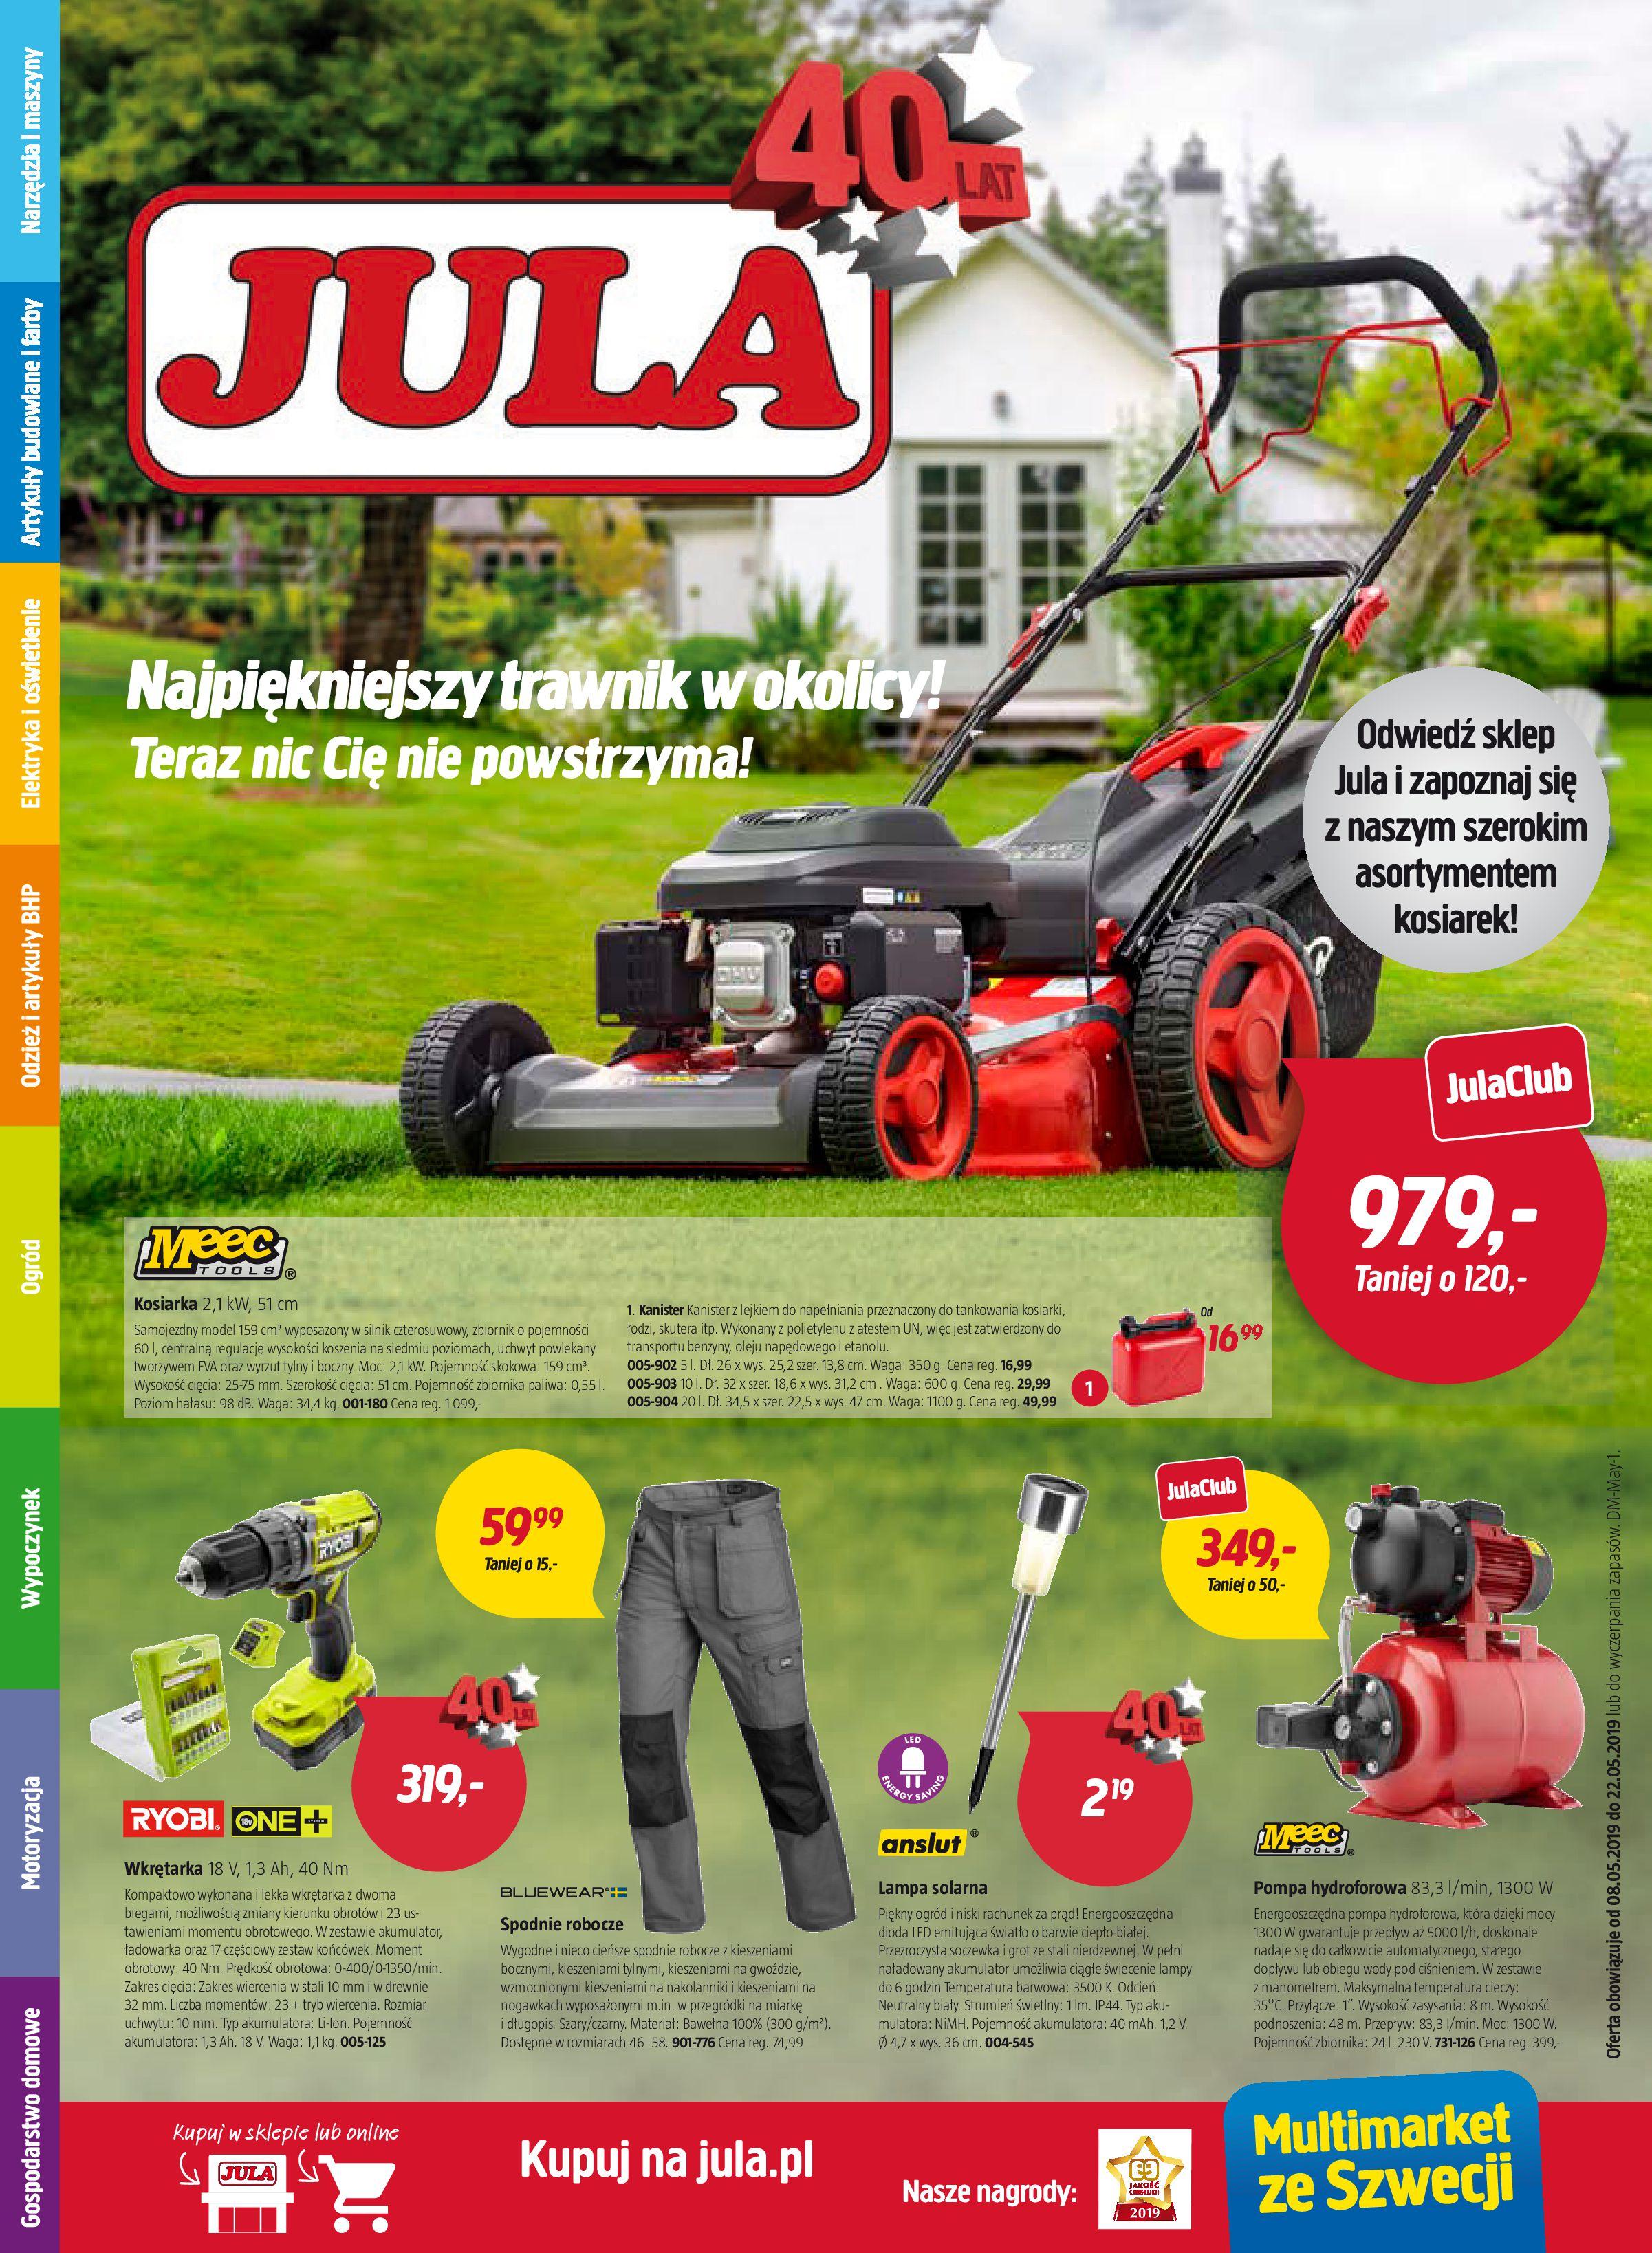 Gazetka Jula - Oferta na art. ogrodnicze-07.05.2019-22.05.2019-page-